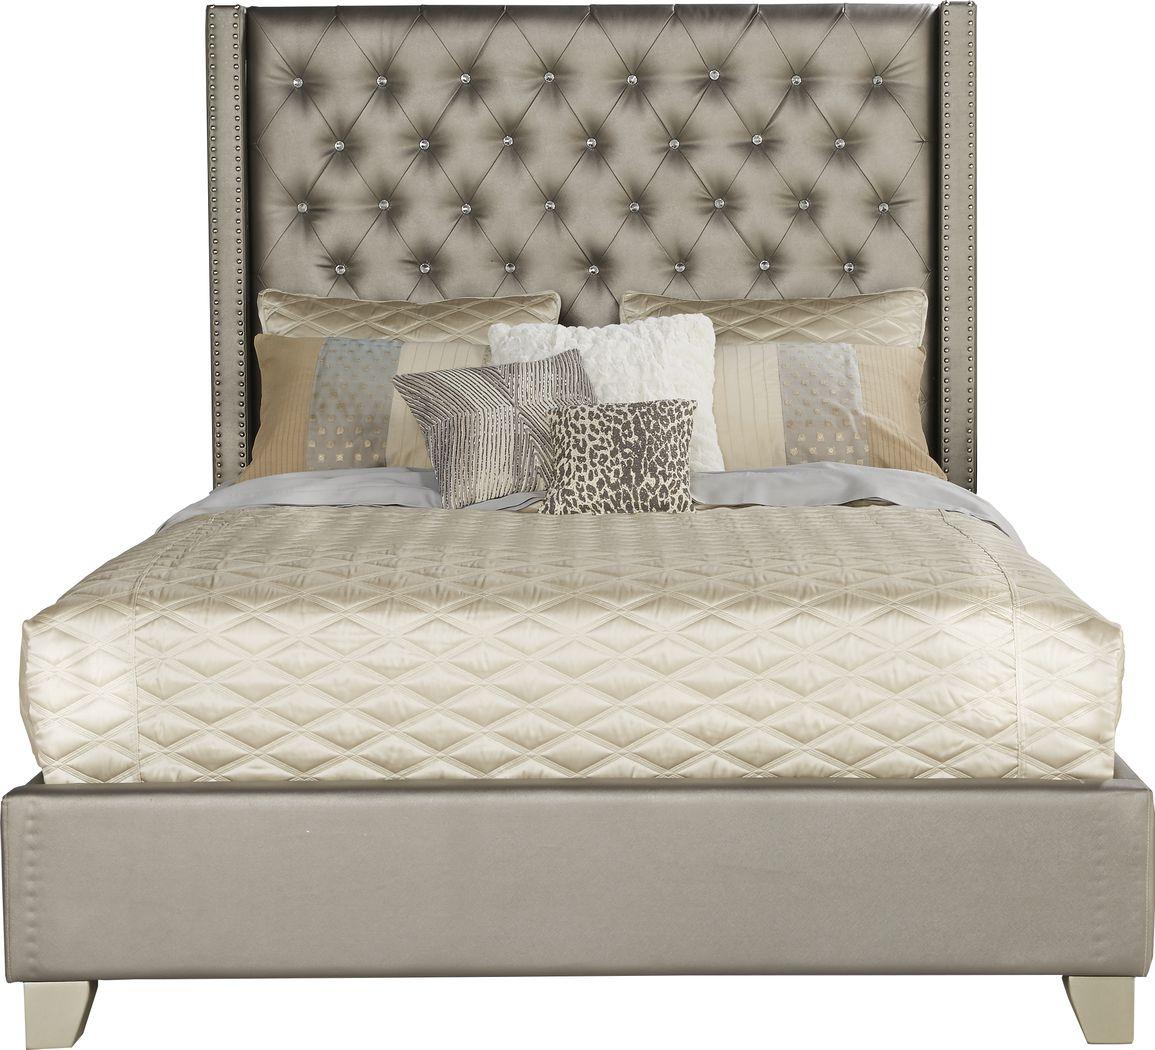 Sofia Vergara Paris Silver 3 Pc Upholstered Queen Bed